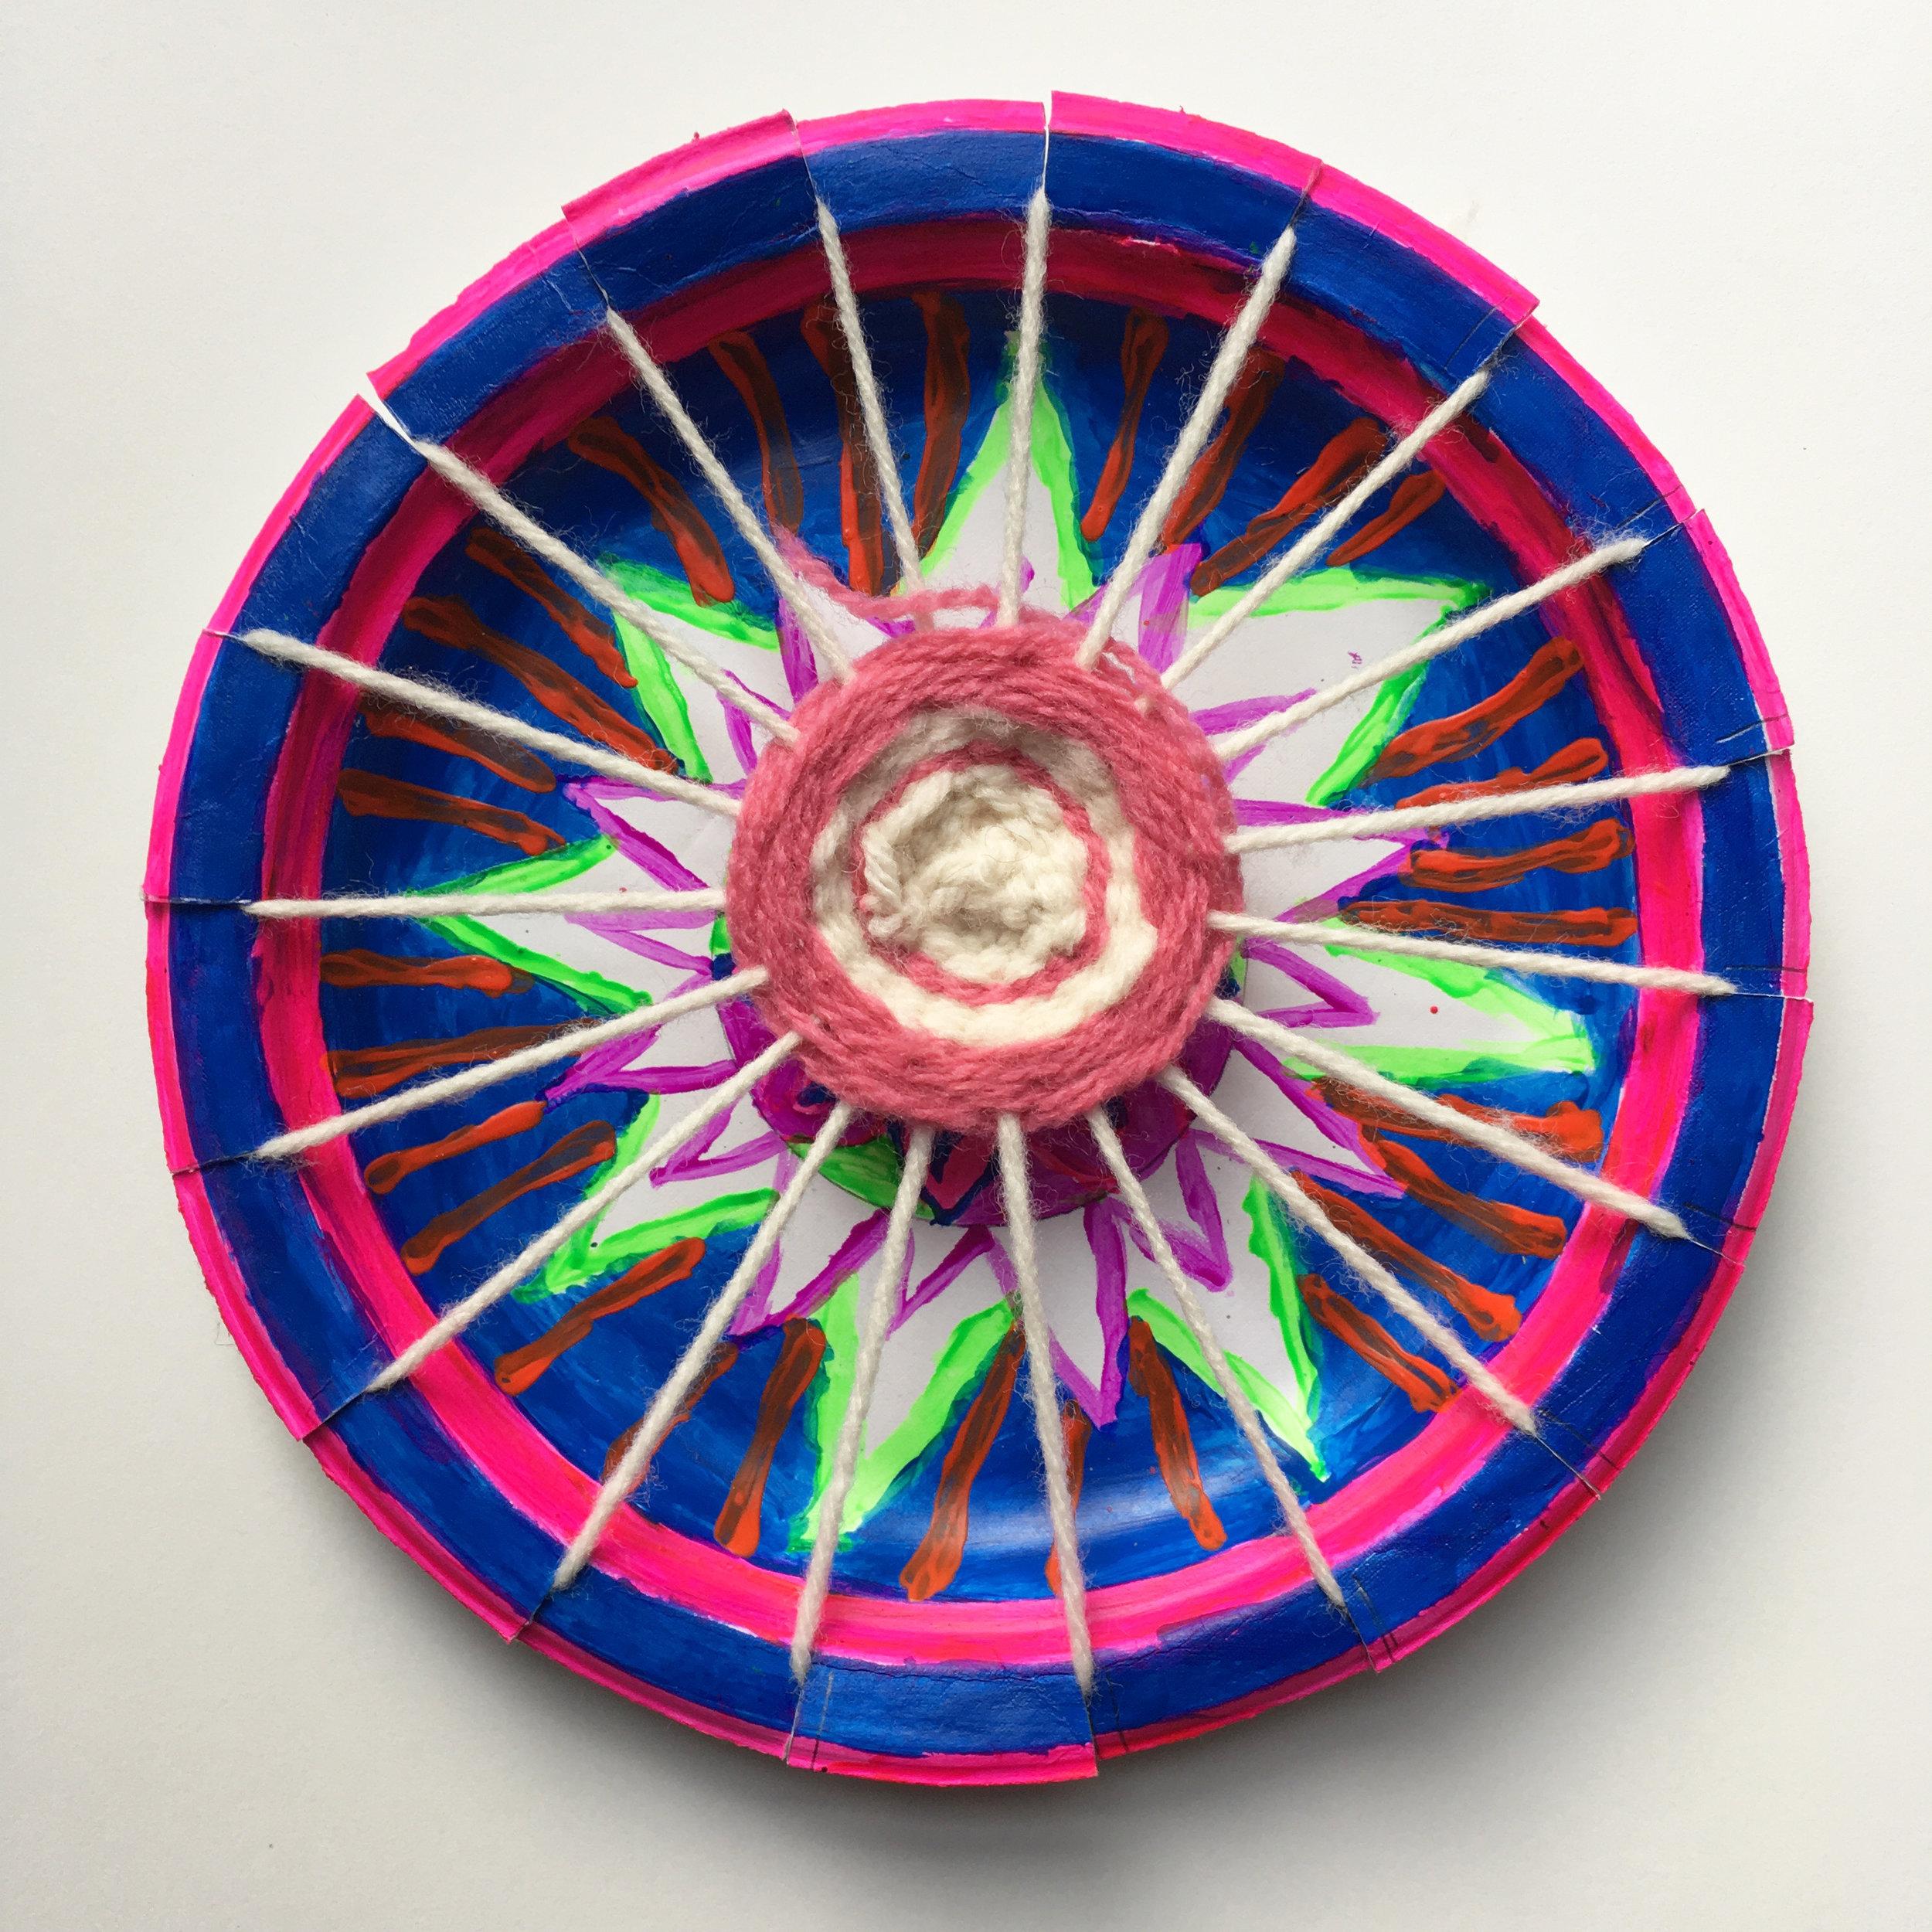 Leilani_circular weaving_01.jpg